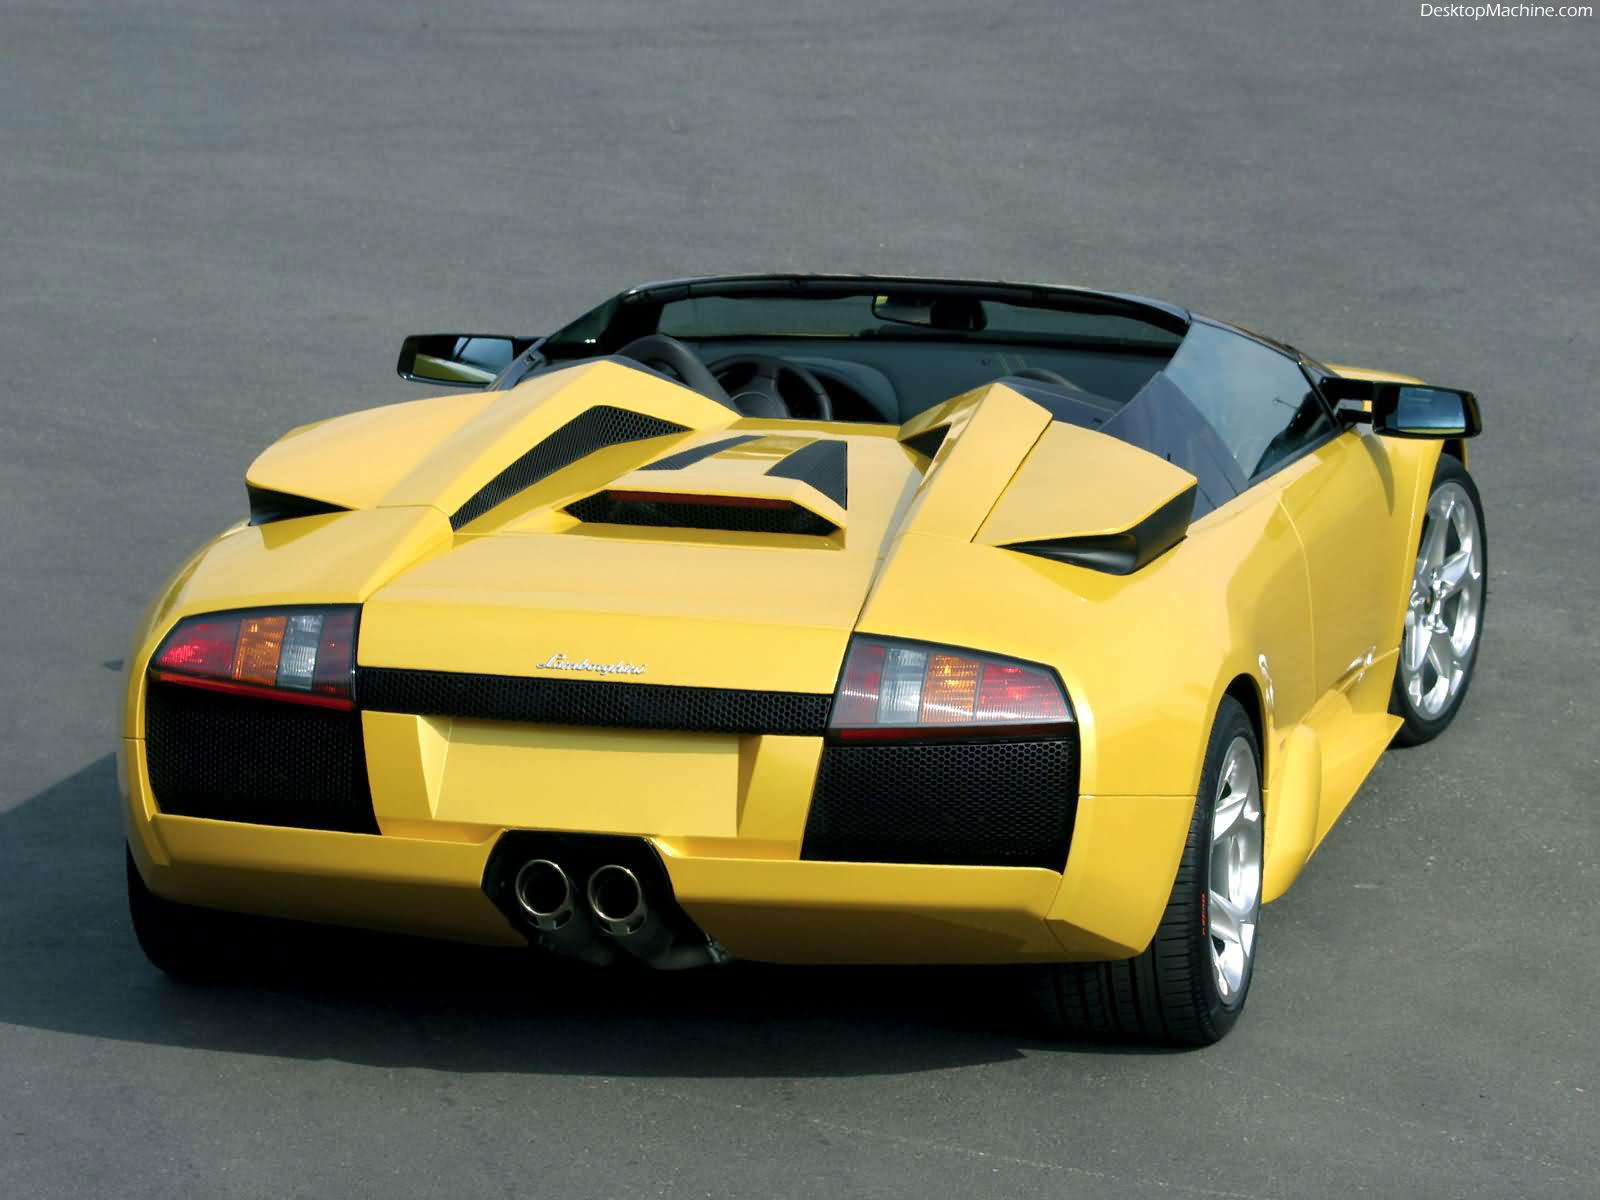 lamborghini murcielago roadster 1600x1200 b32 tapety na pulpit samochody. Black Bedroom Furniture Sets. Home Design Ideas